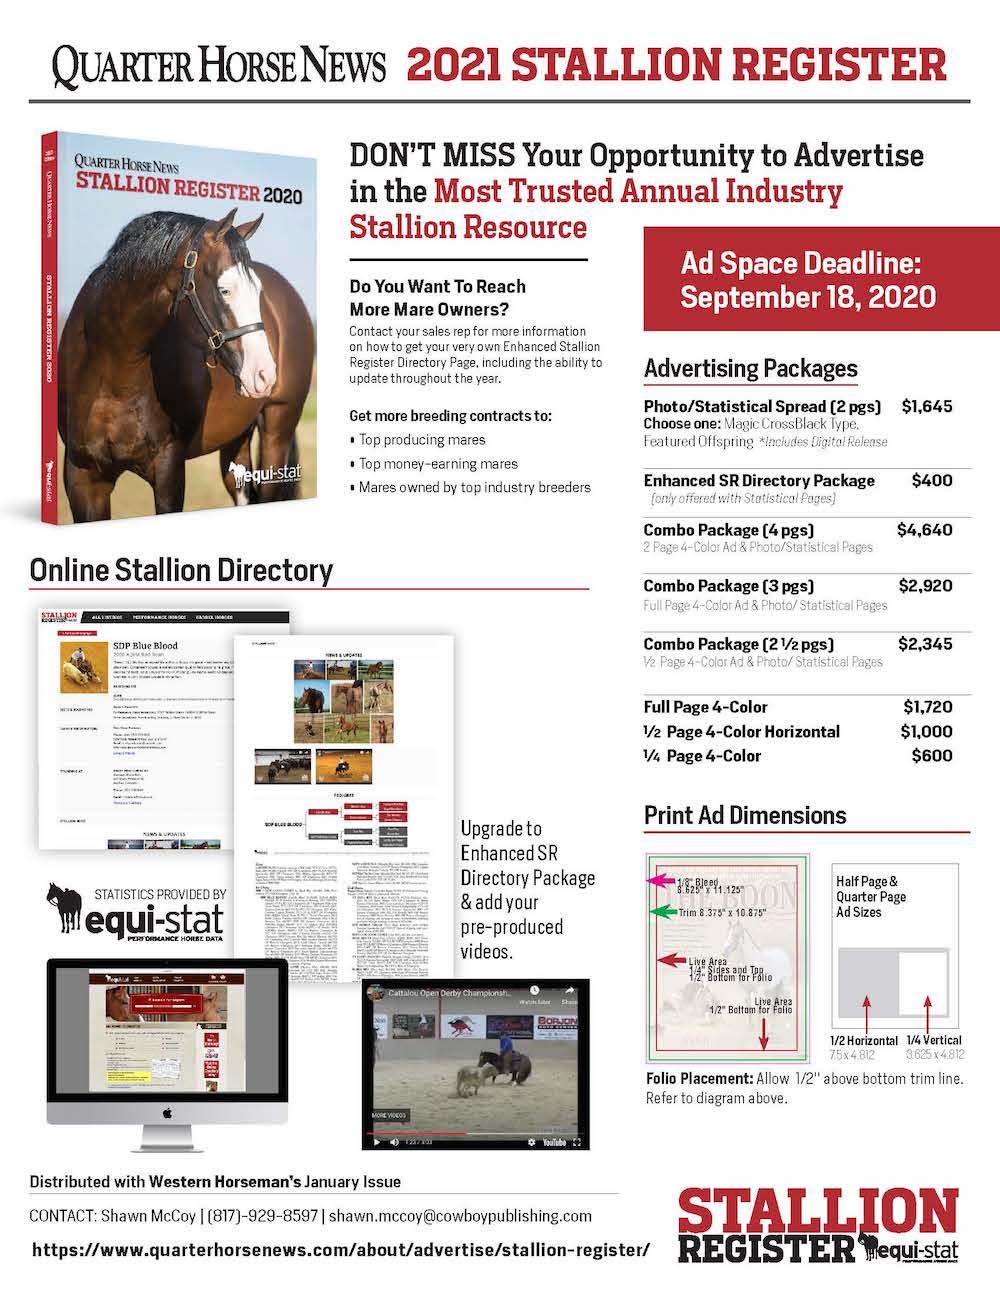 stallion register sales info page